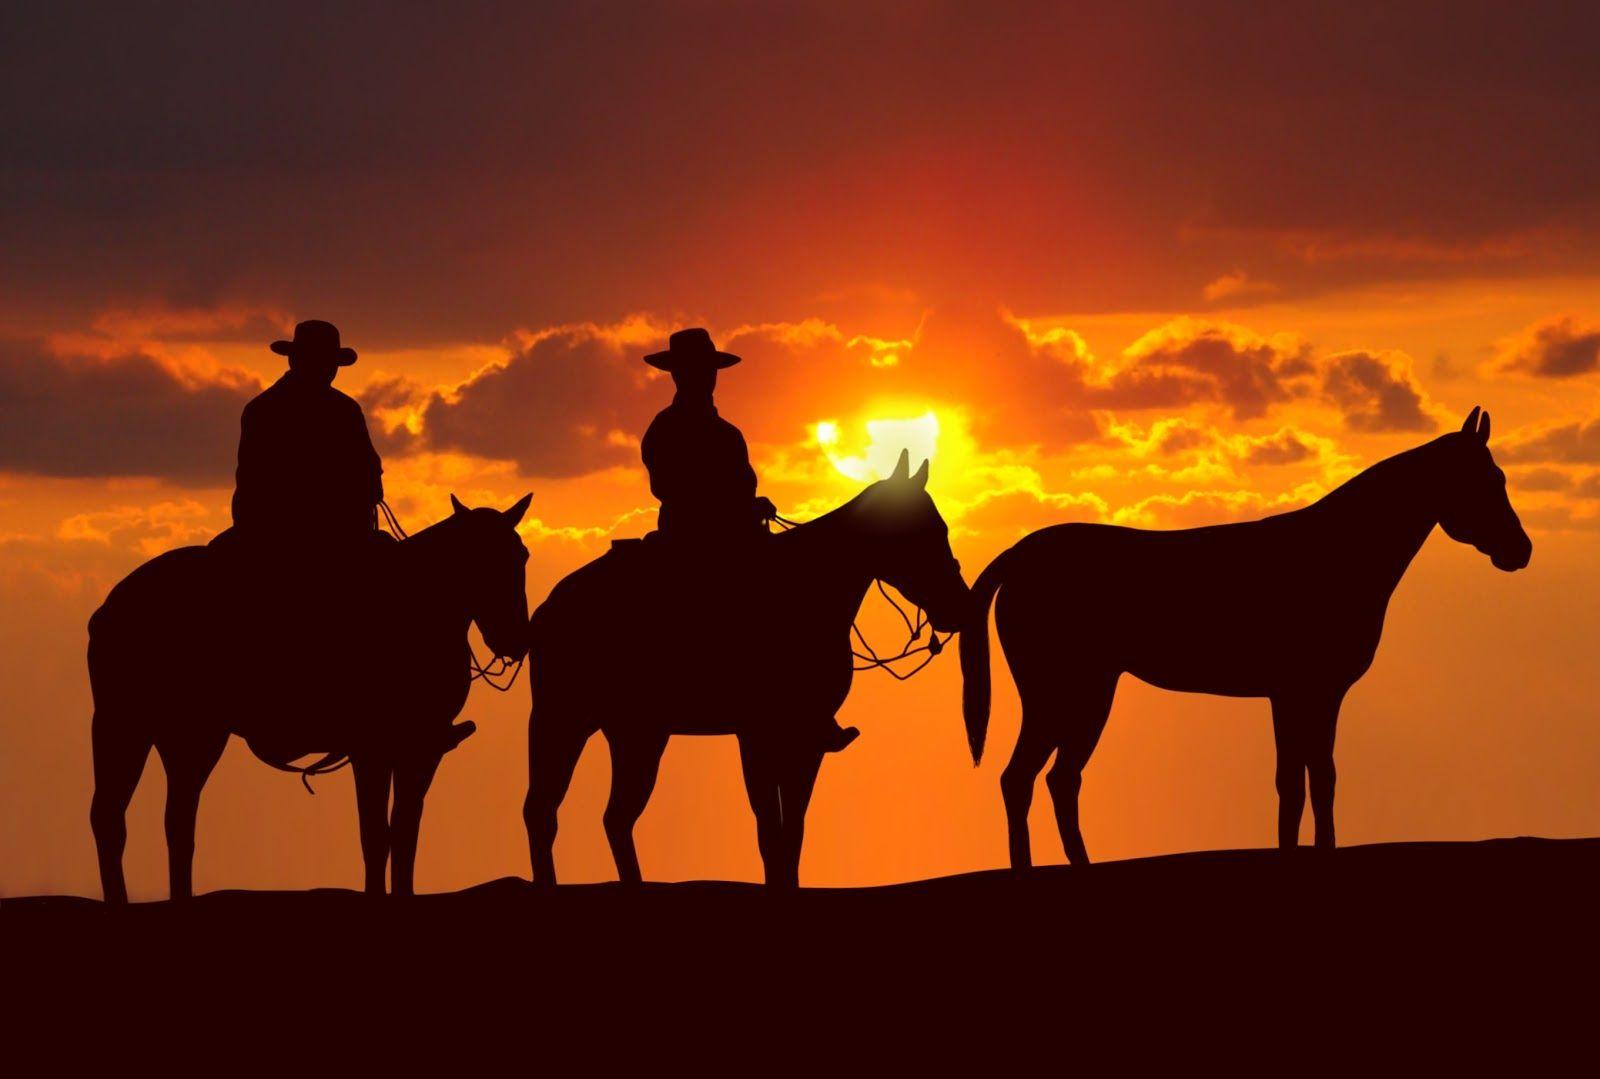 texas longhorns iphone wallpaper, dallas texas wallpaper